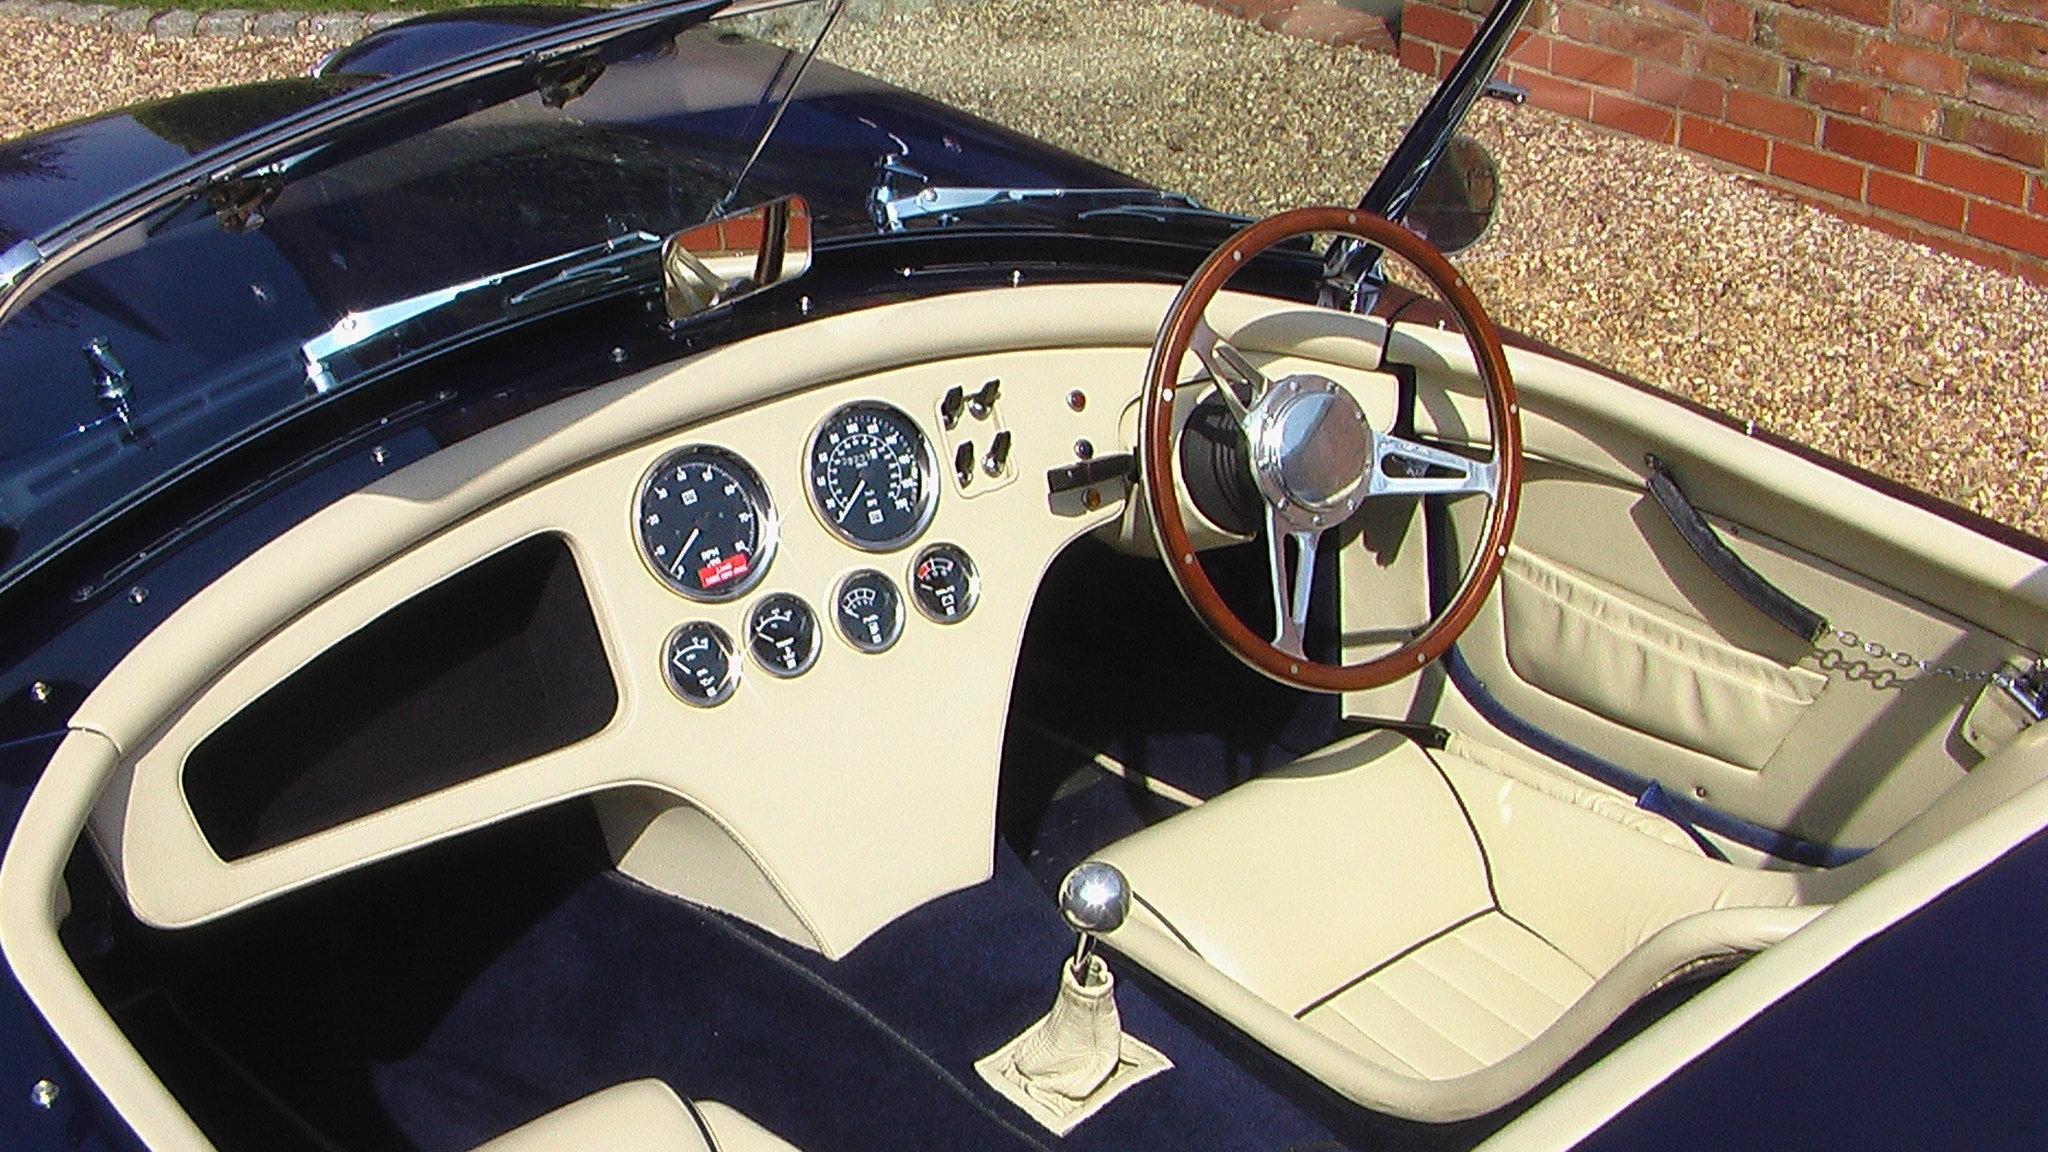 1998 6.5L CHEVY V8, DAX TOJEIRO COBRA For Sale (picture 4 of 6)